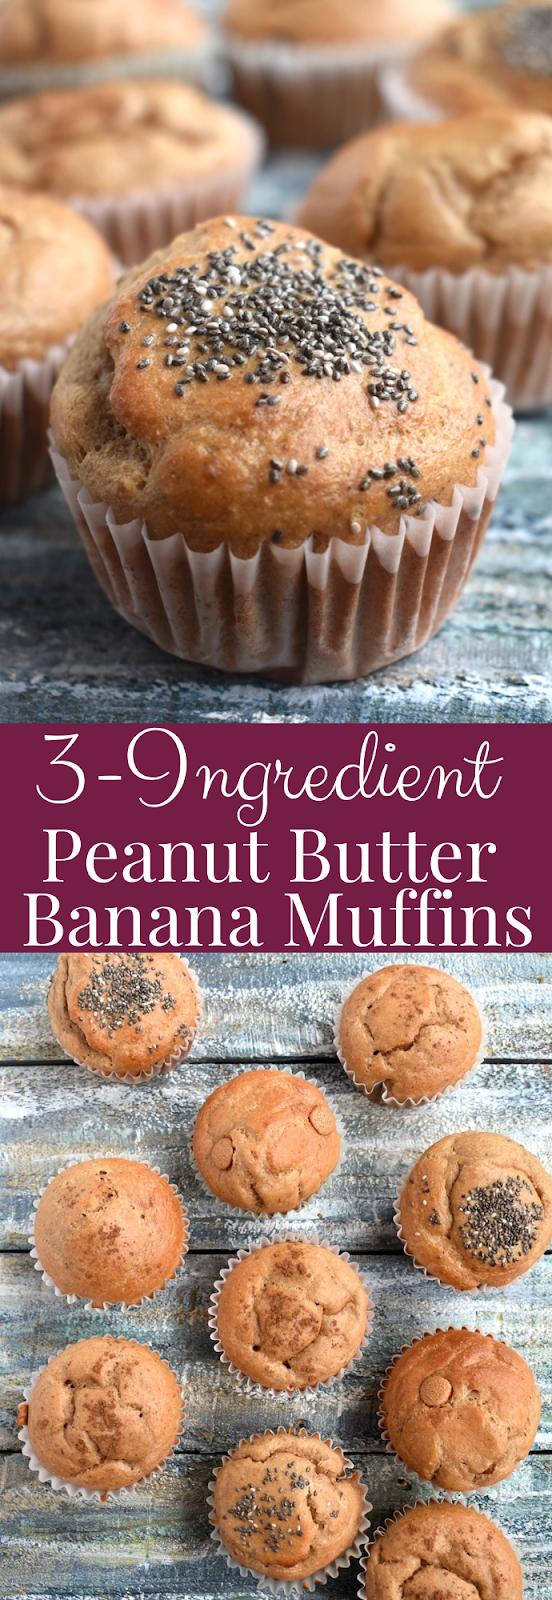 3-Ingredient Peanut Butter Banana Muffins